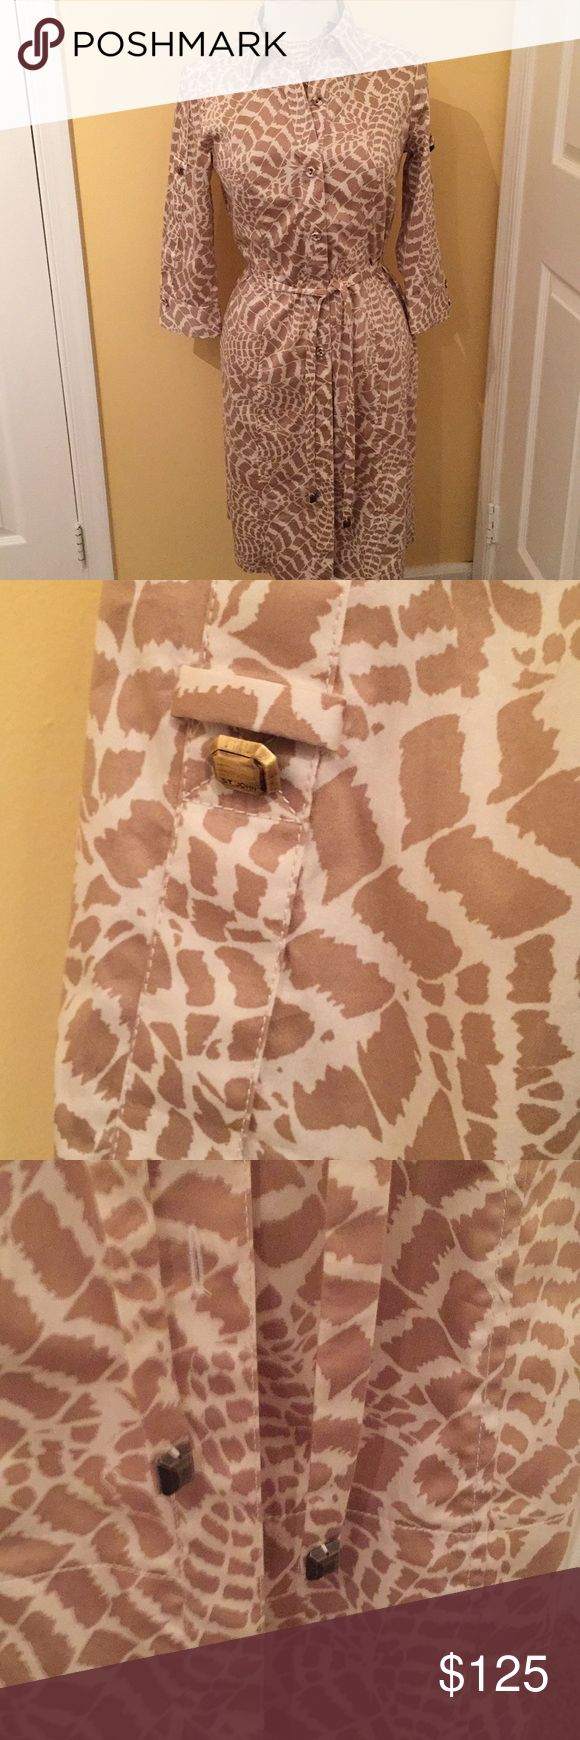 St John Sport Dress Animal Print Button Down Dress